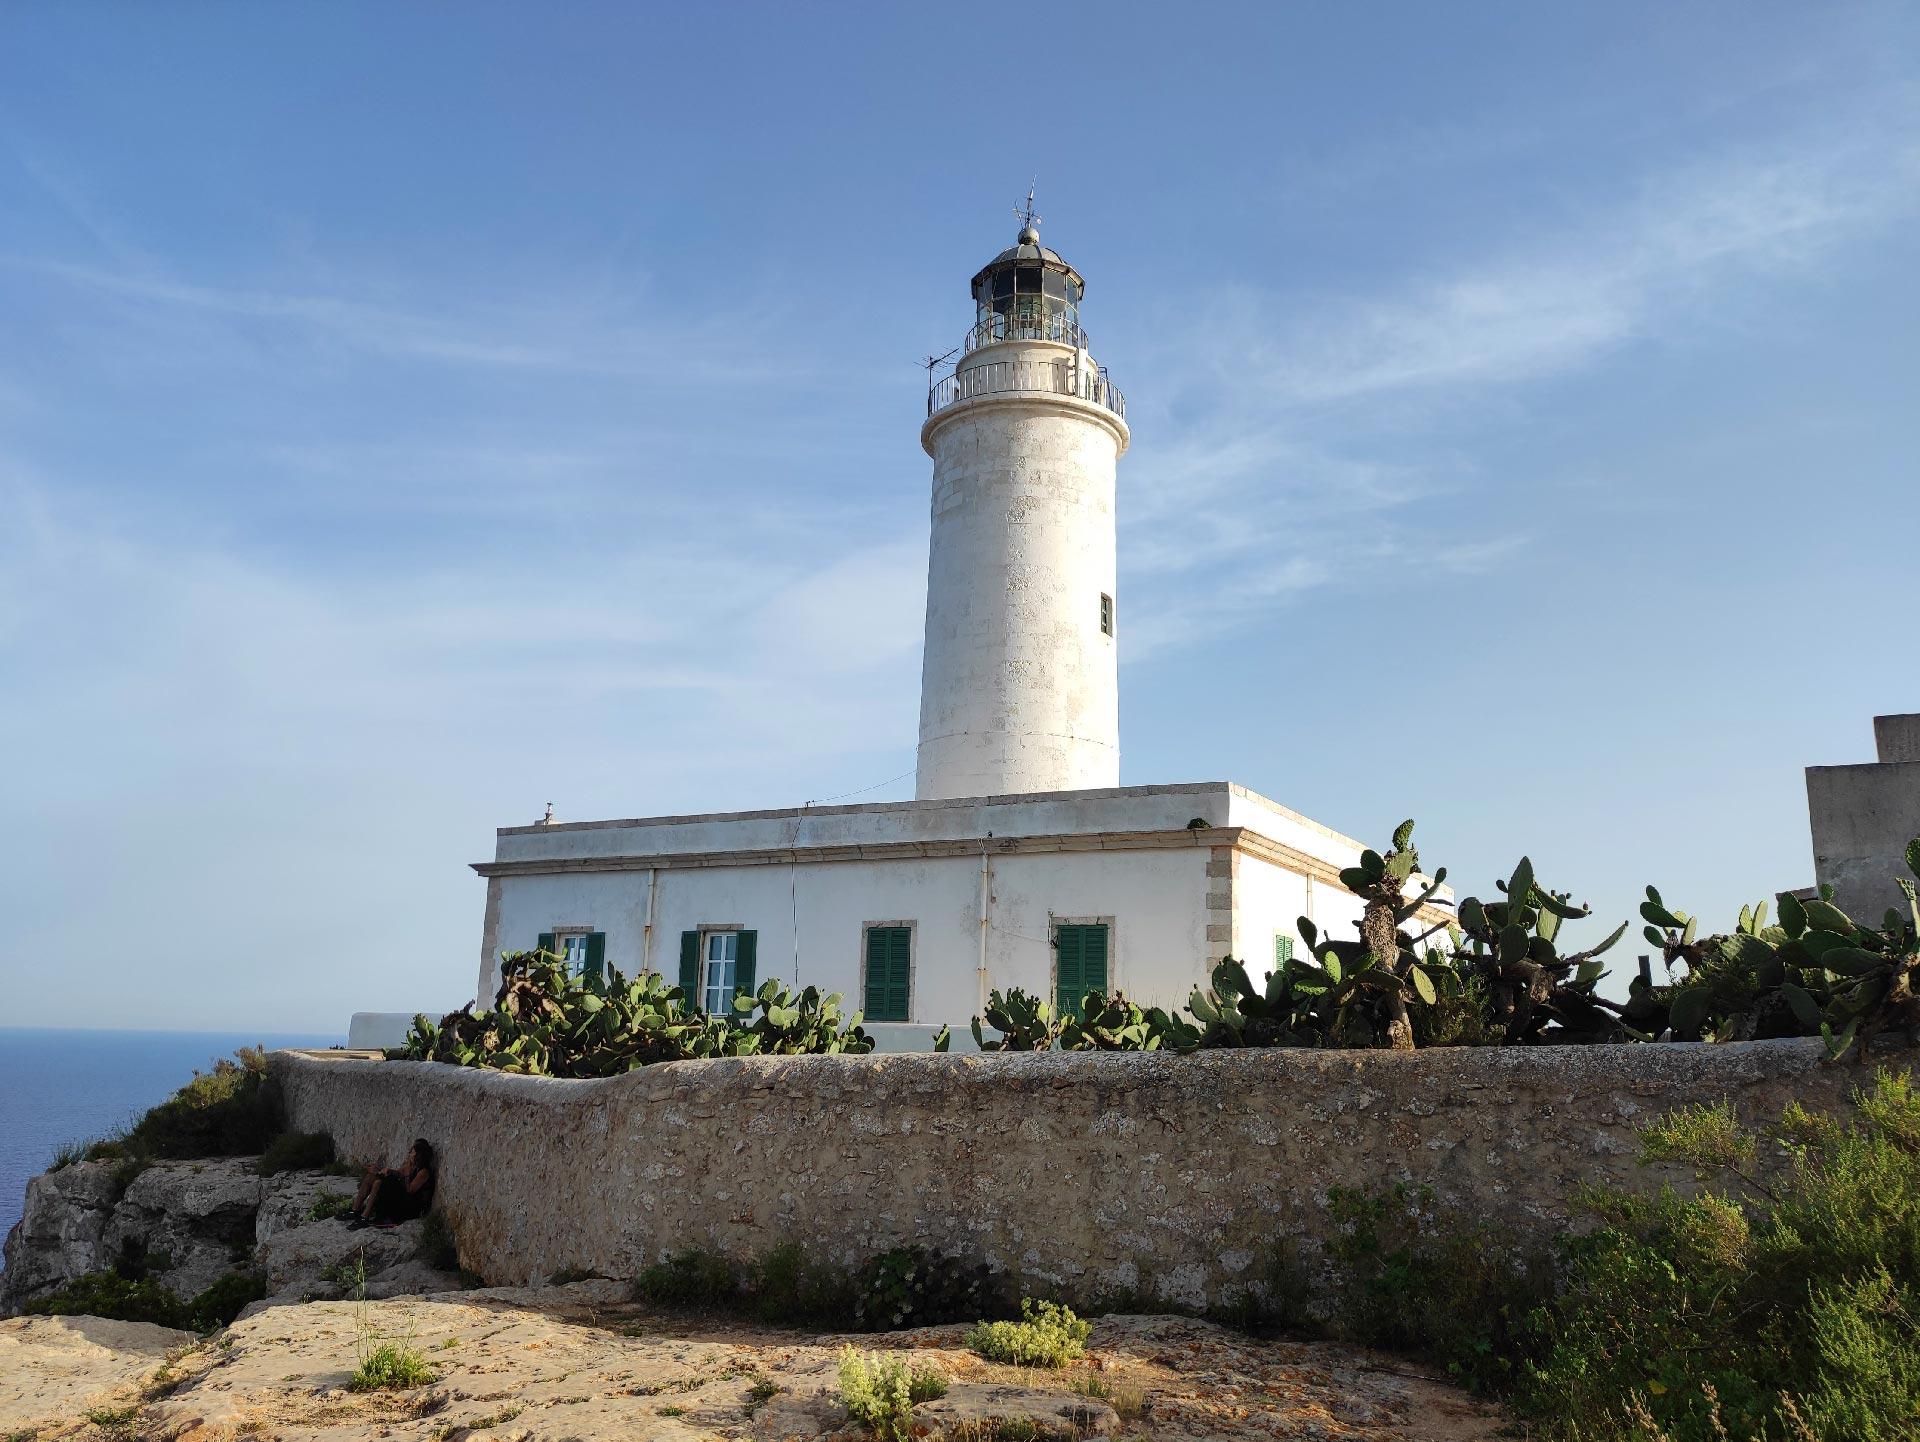 Il faro di El Pilar de la Mola